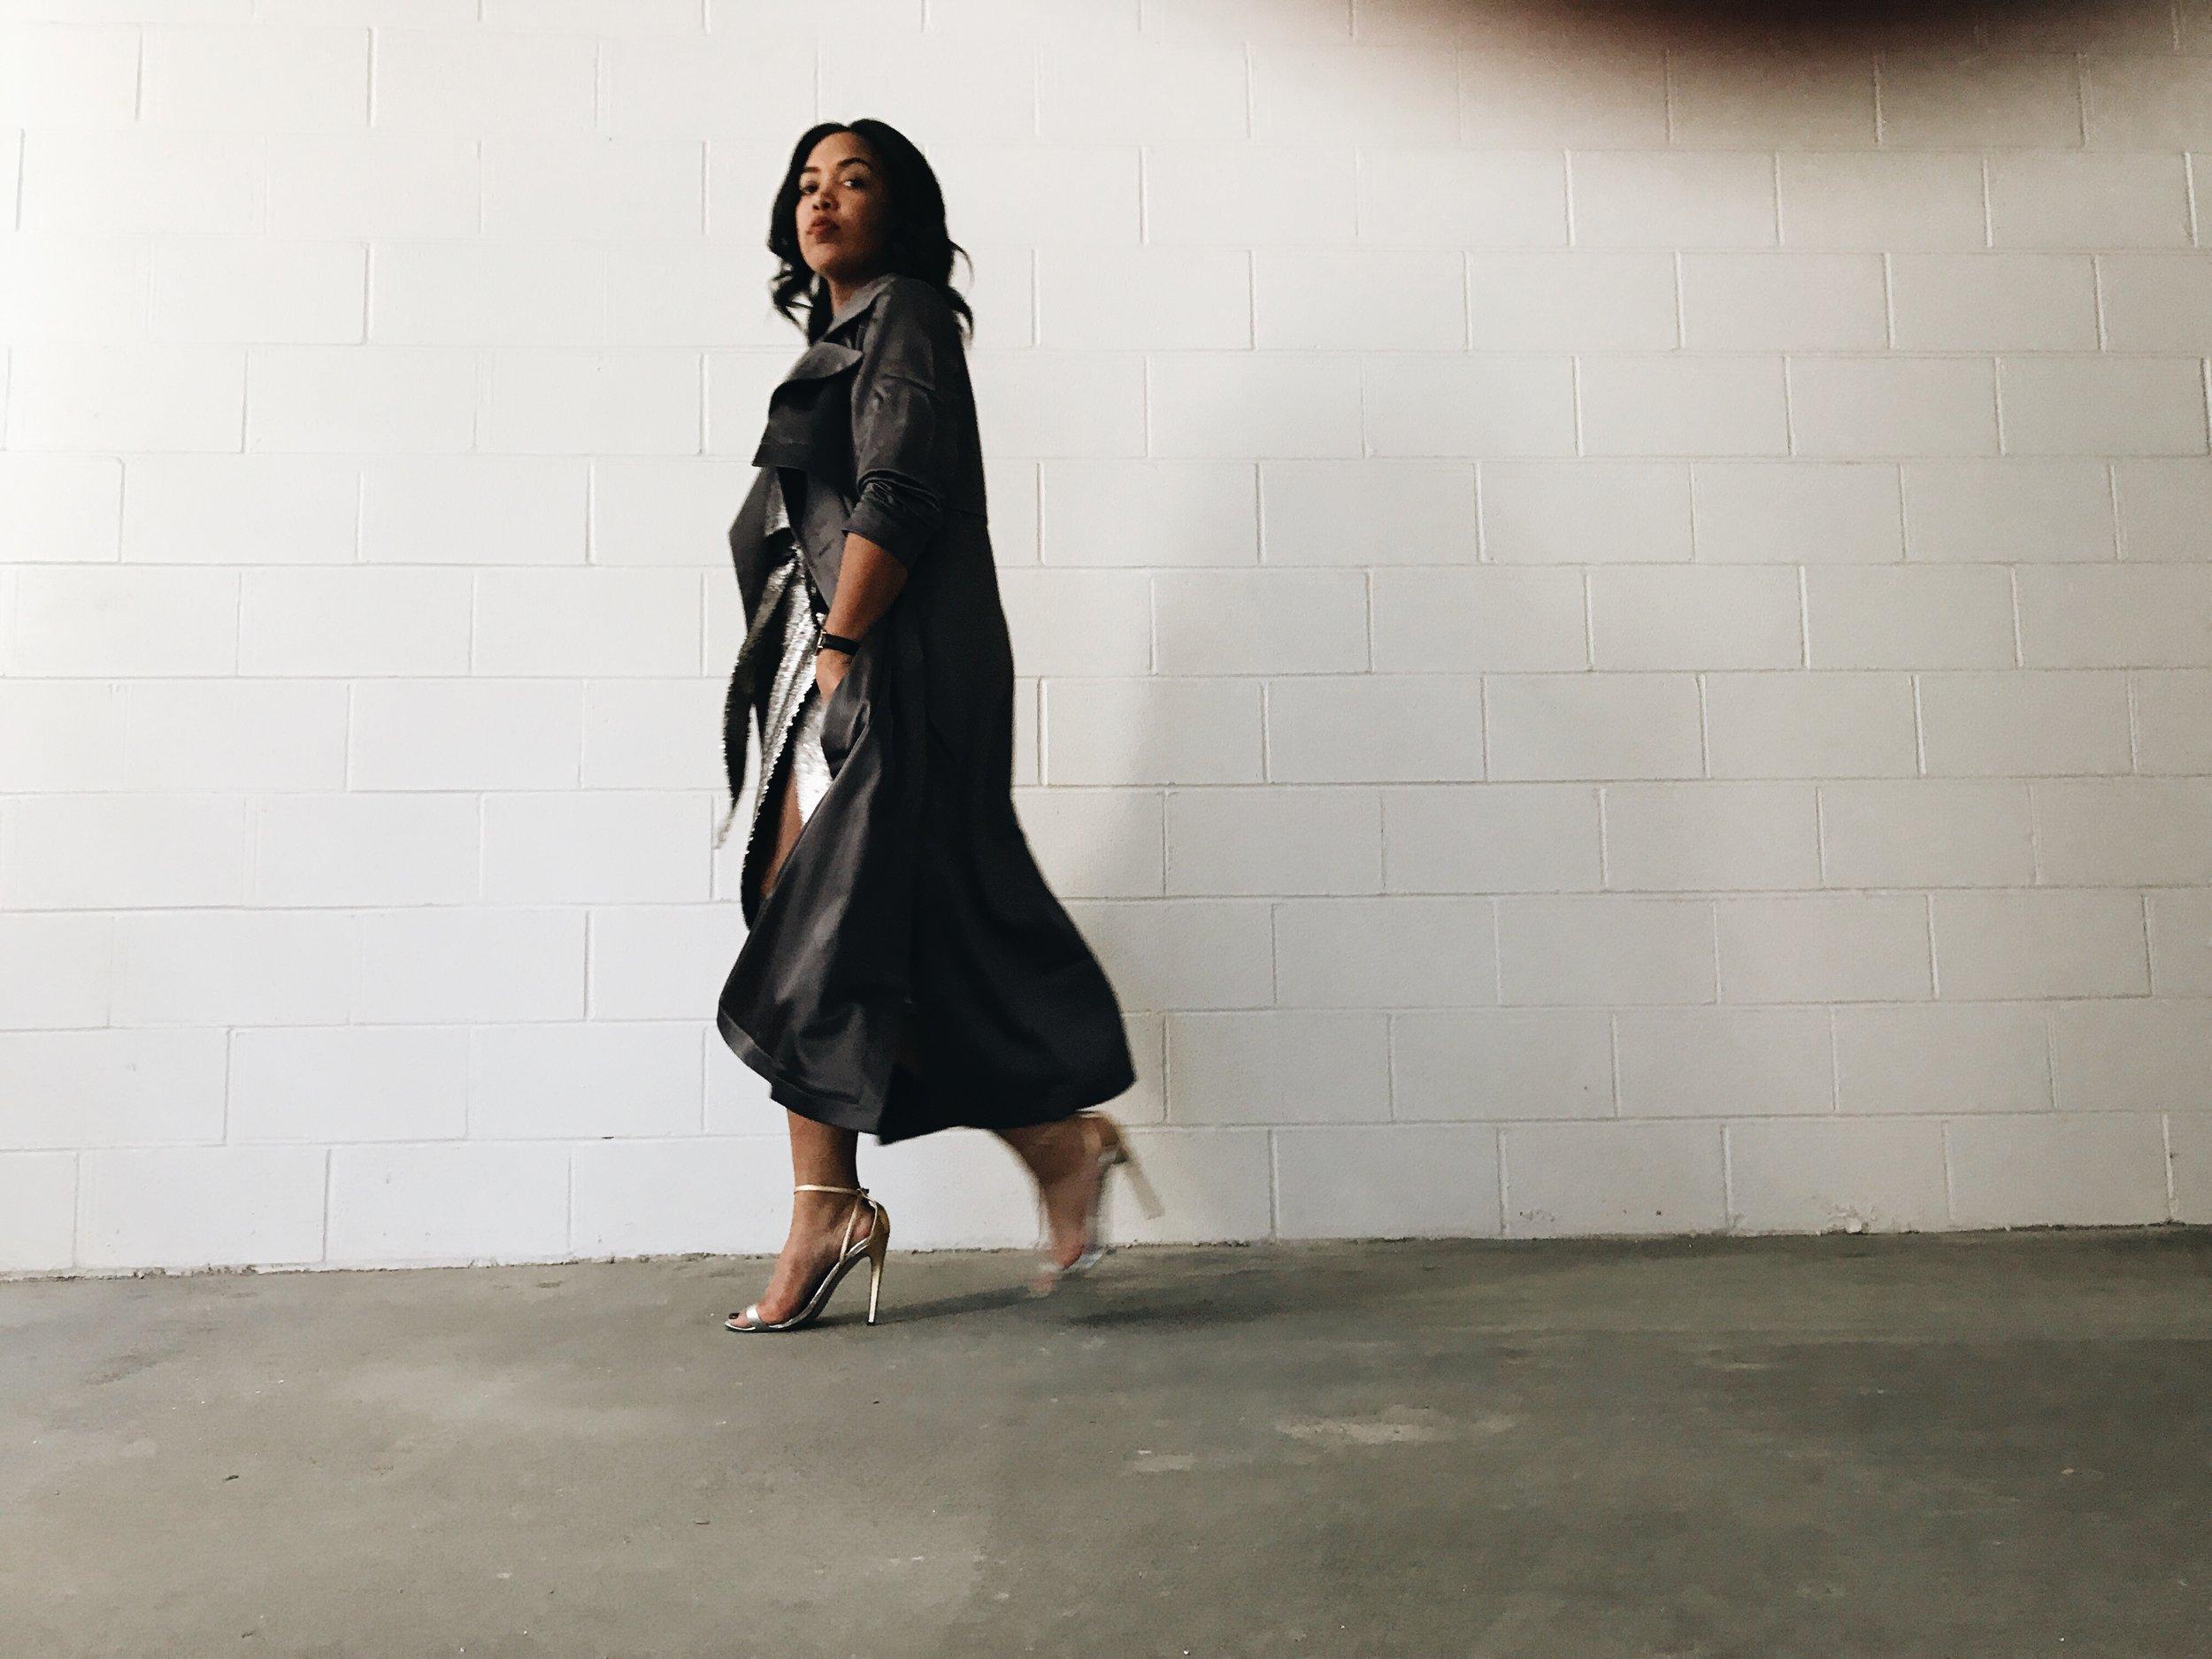 6-Lavish-Alice-Sequin-Dress-ASOS-Satin-Trench-Coat-Metallic-Heels-NYE-outfit.jpg